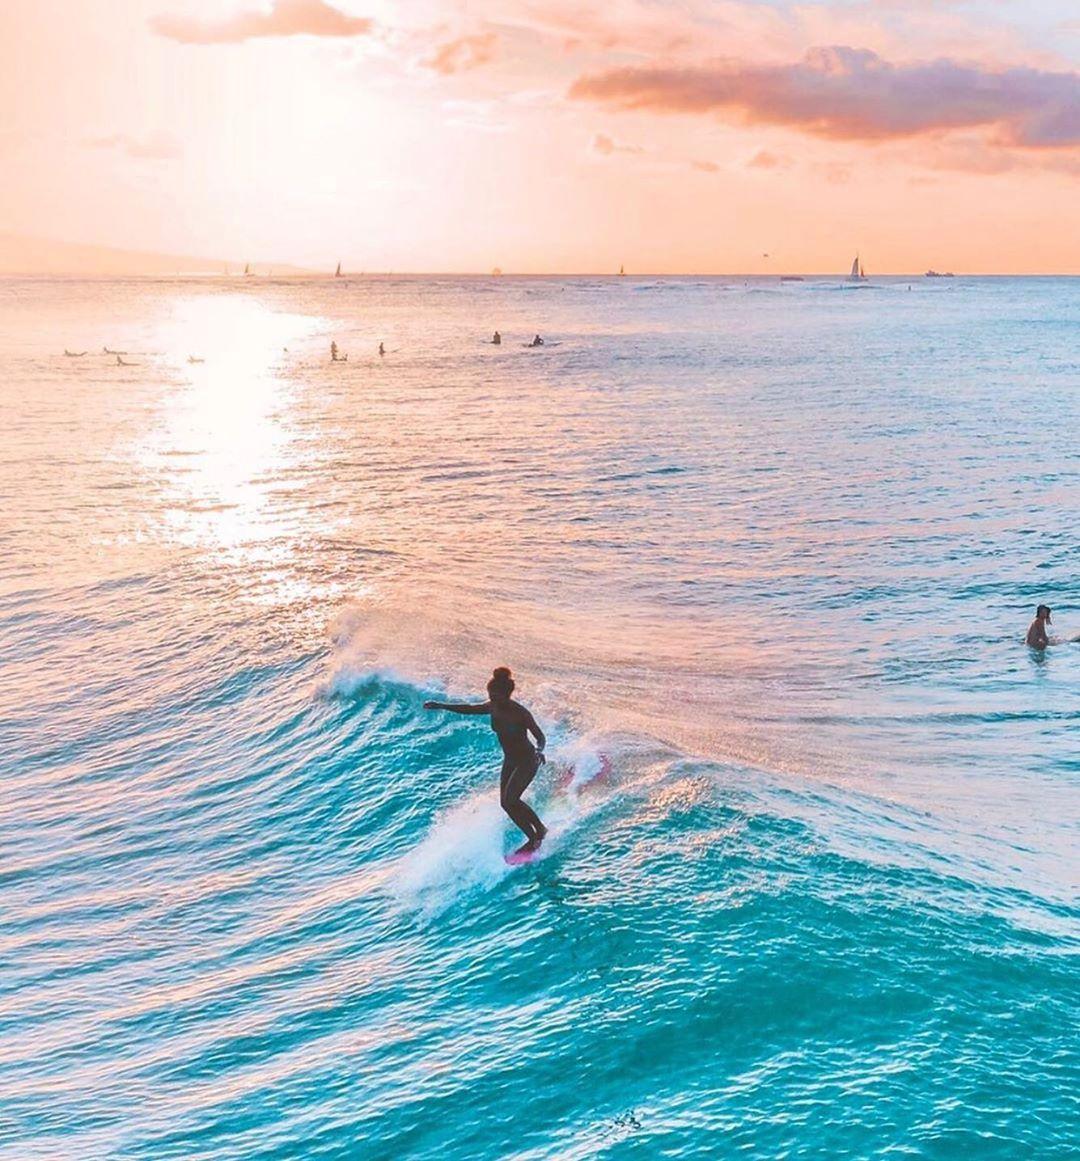 "Nique Miller | Surfer on Instagram: ""Sunsets at home 🌅 are the best @billabongwomens #creaturesofcolor . . . . . . . . #billabongwomens #goldenhourlight #surf_shots…"""